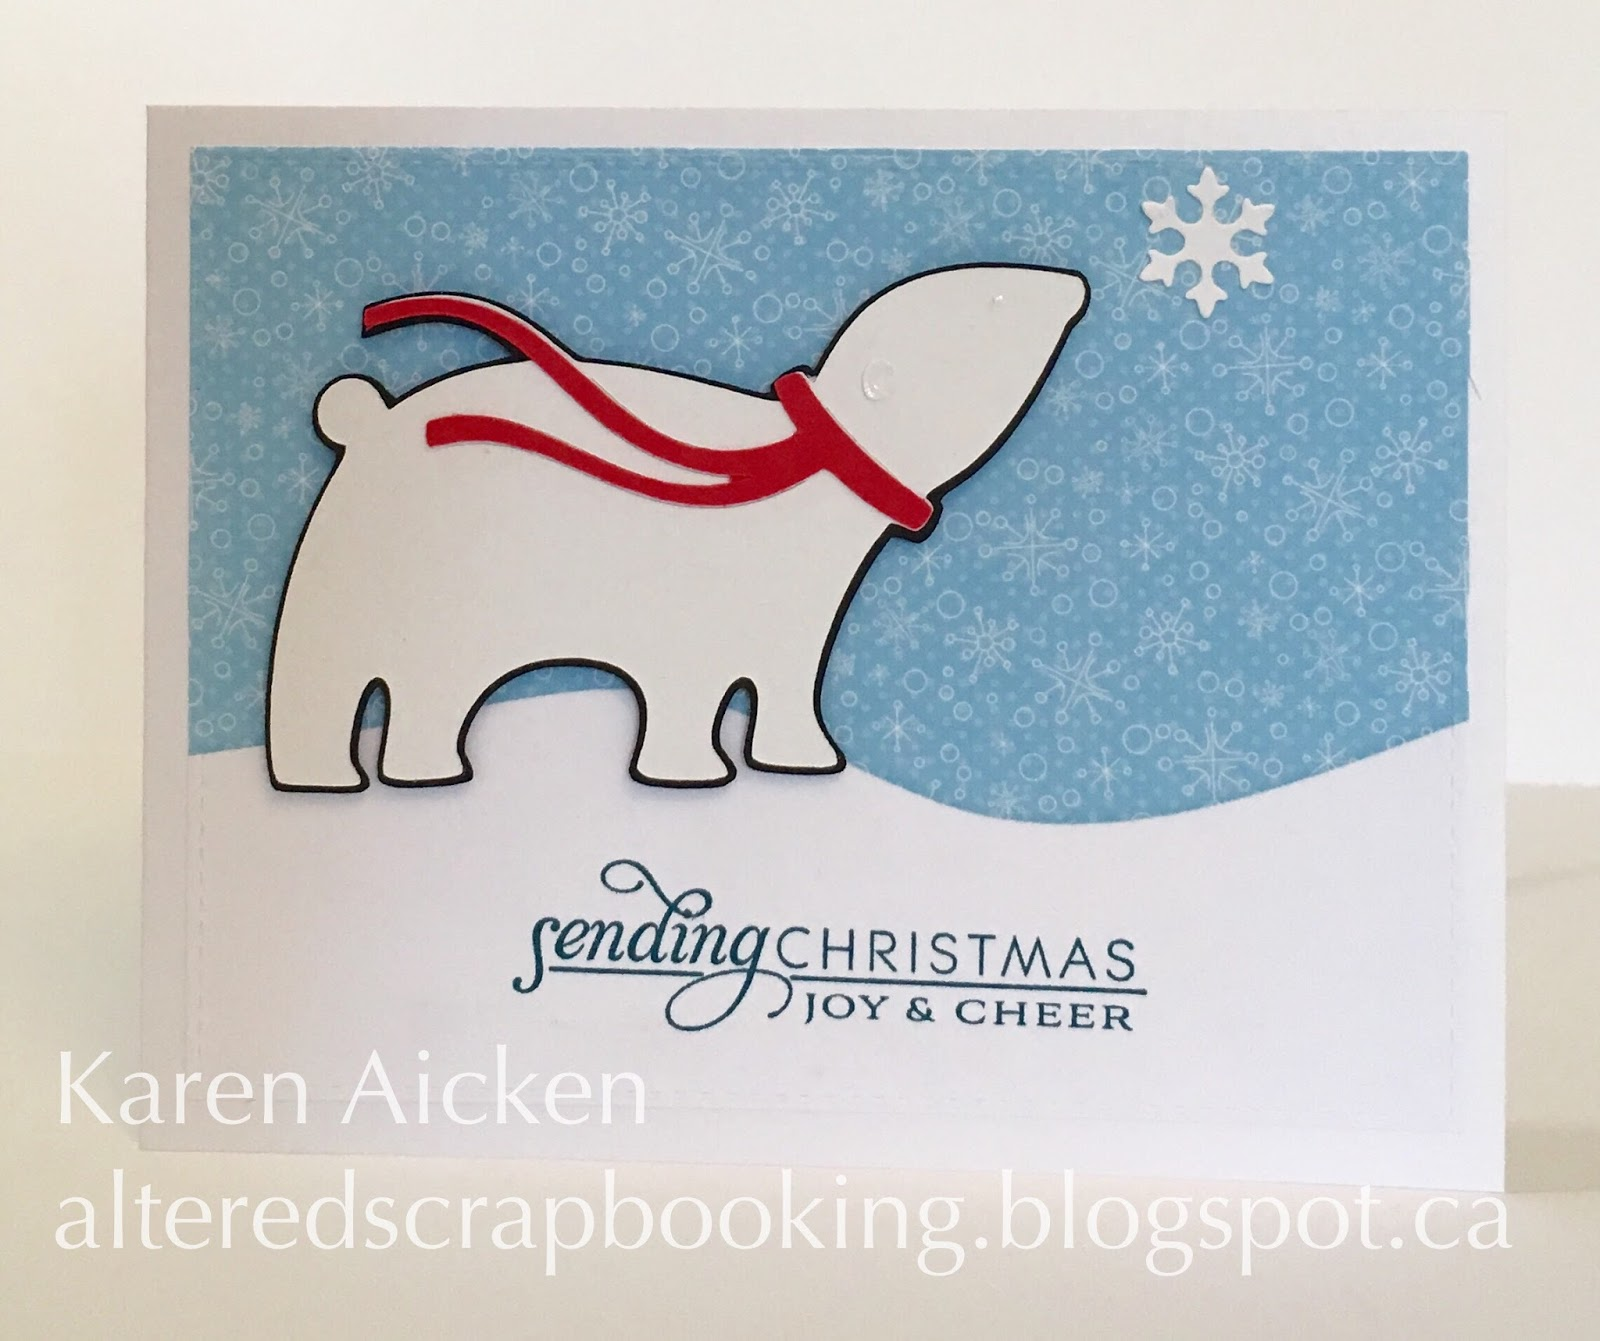 Altered Scrapbooking: Polar Bear Christmas Cards